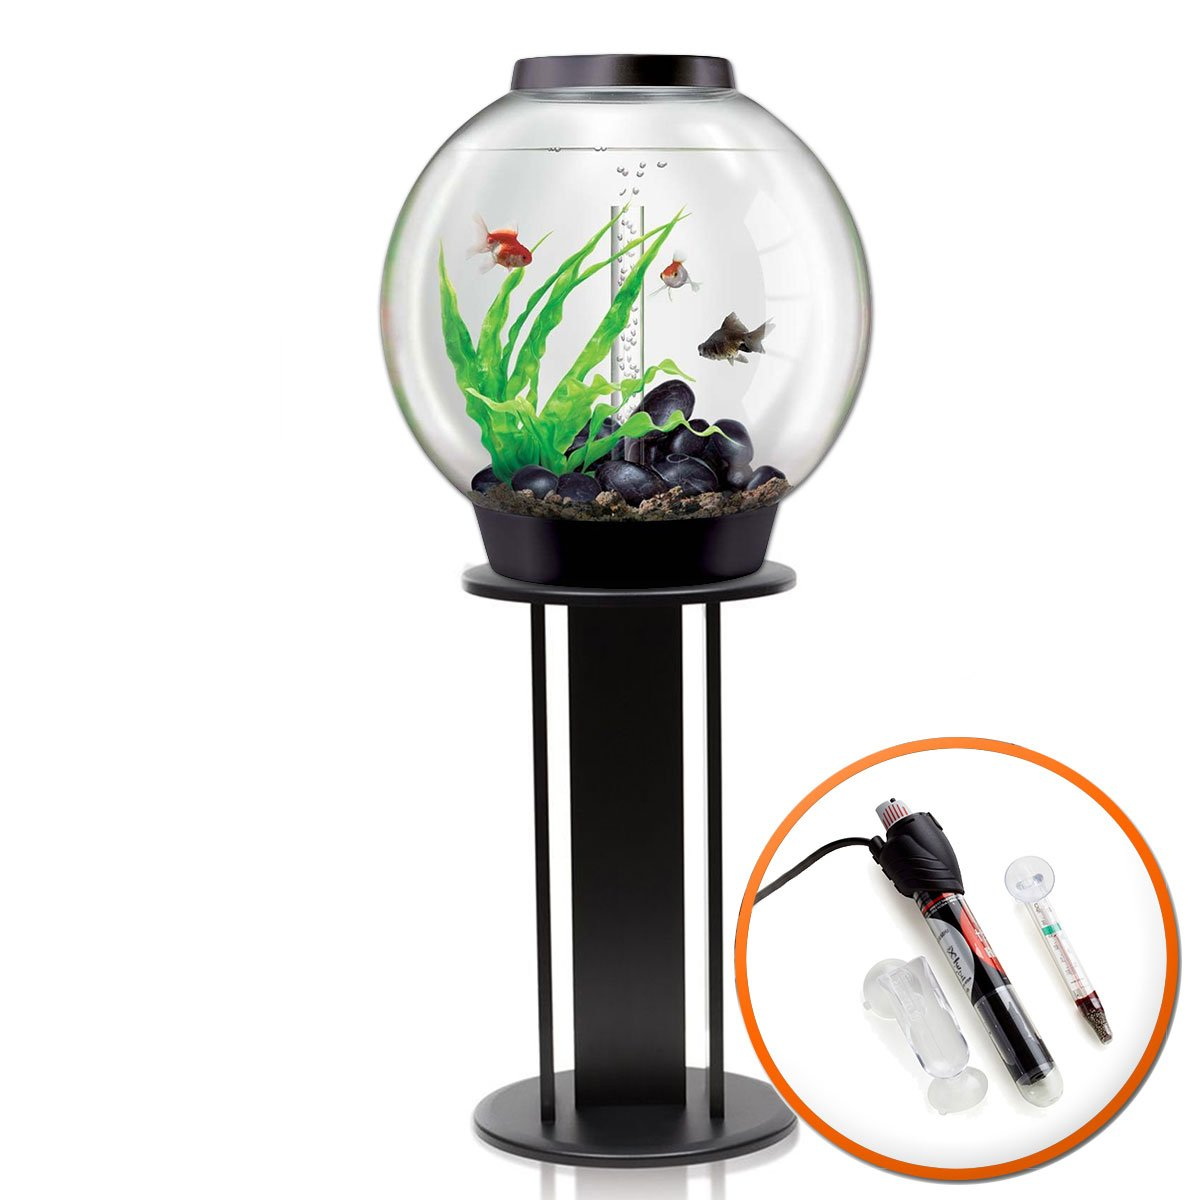 BiOrb Classic 60L Tropical Aquarium in Black with Standard LED Lighting & Black Stand